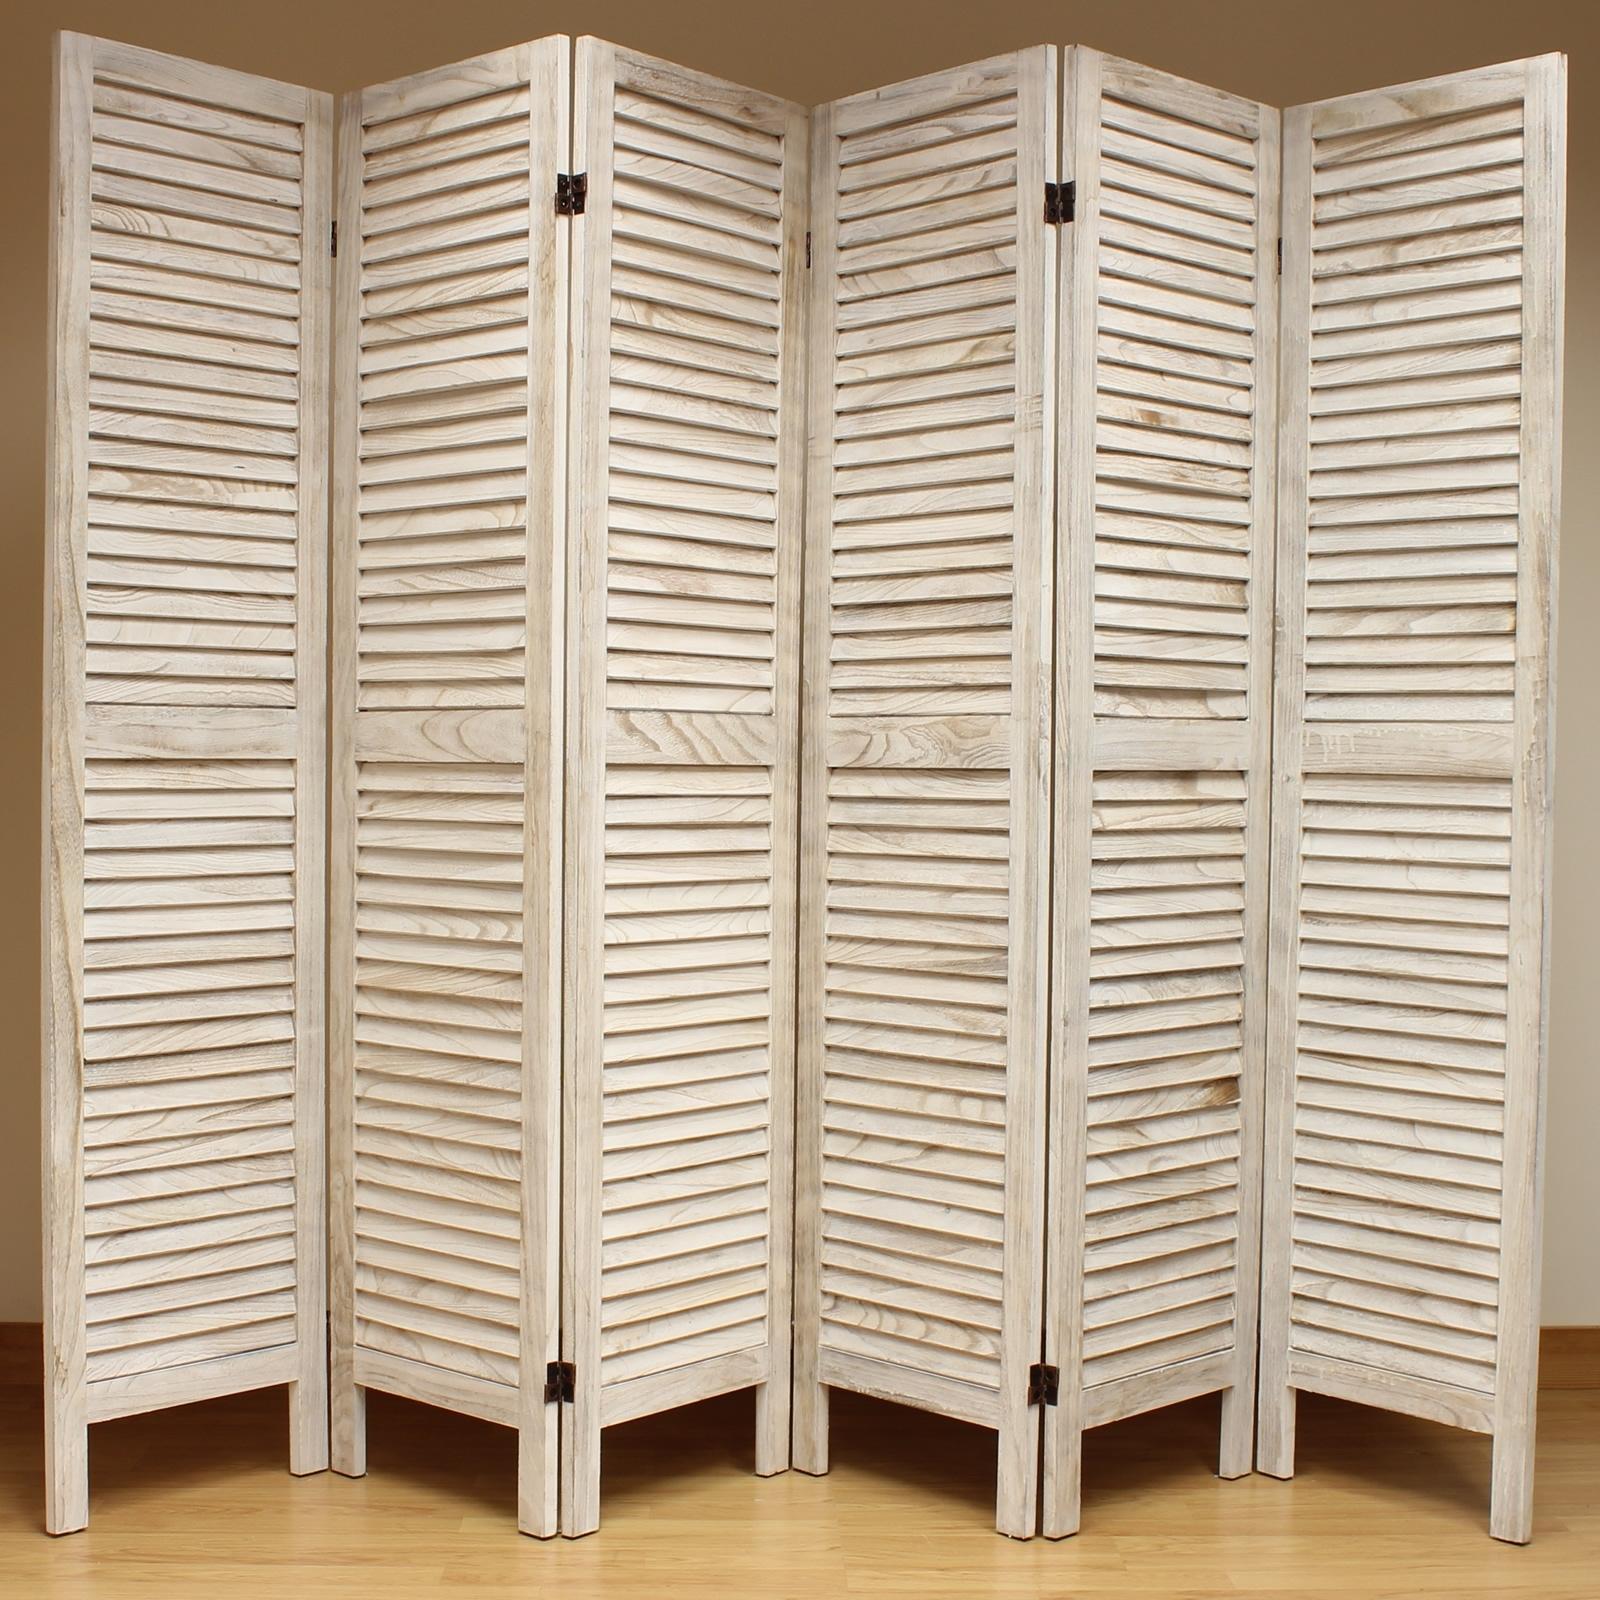 Divider: Extraordinary Divider Screens Screenflex, Curtain Room Inside Room Dividers & Decorative Screens Ideas (Image 6 of 12)